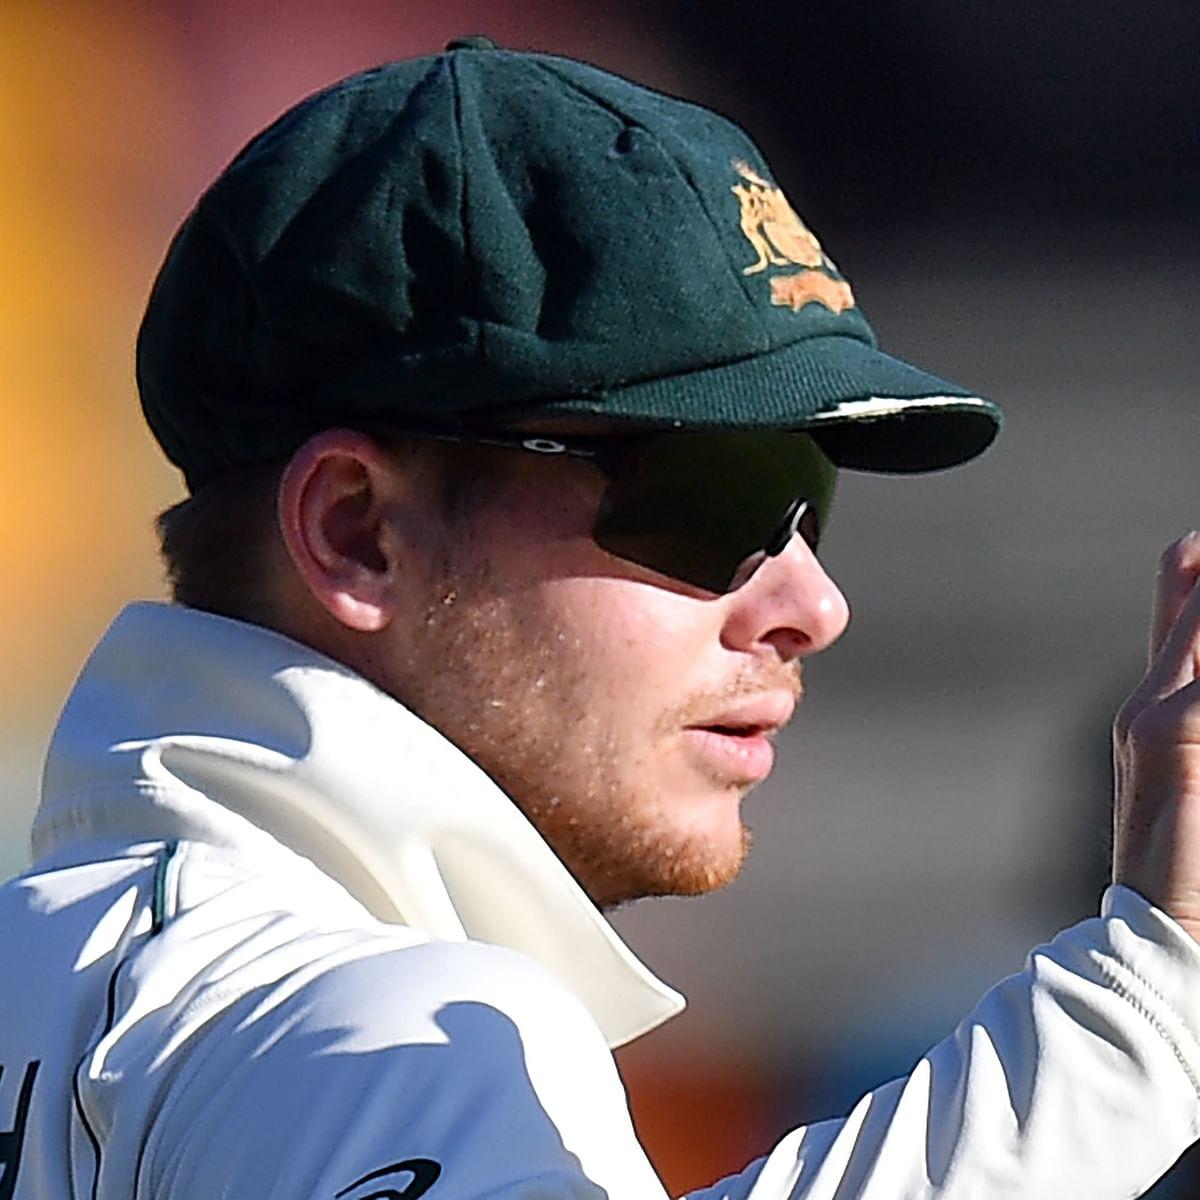 India vs Australia: Is the captain all ears?